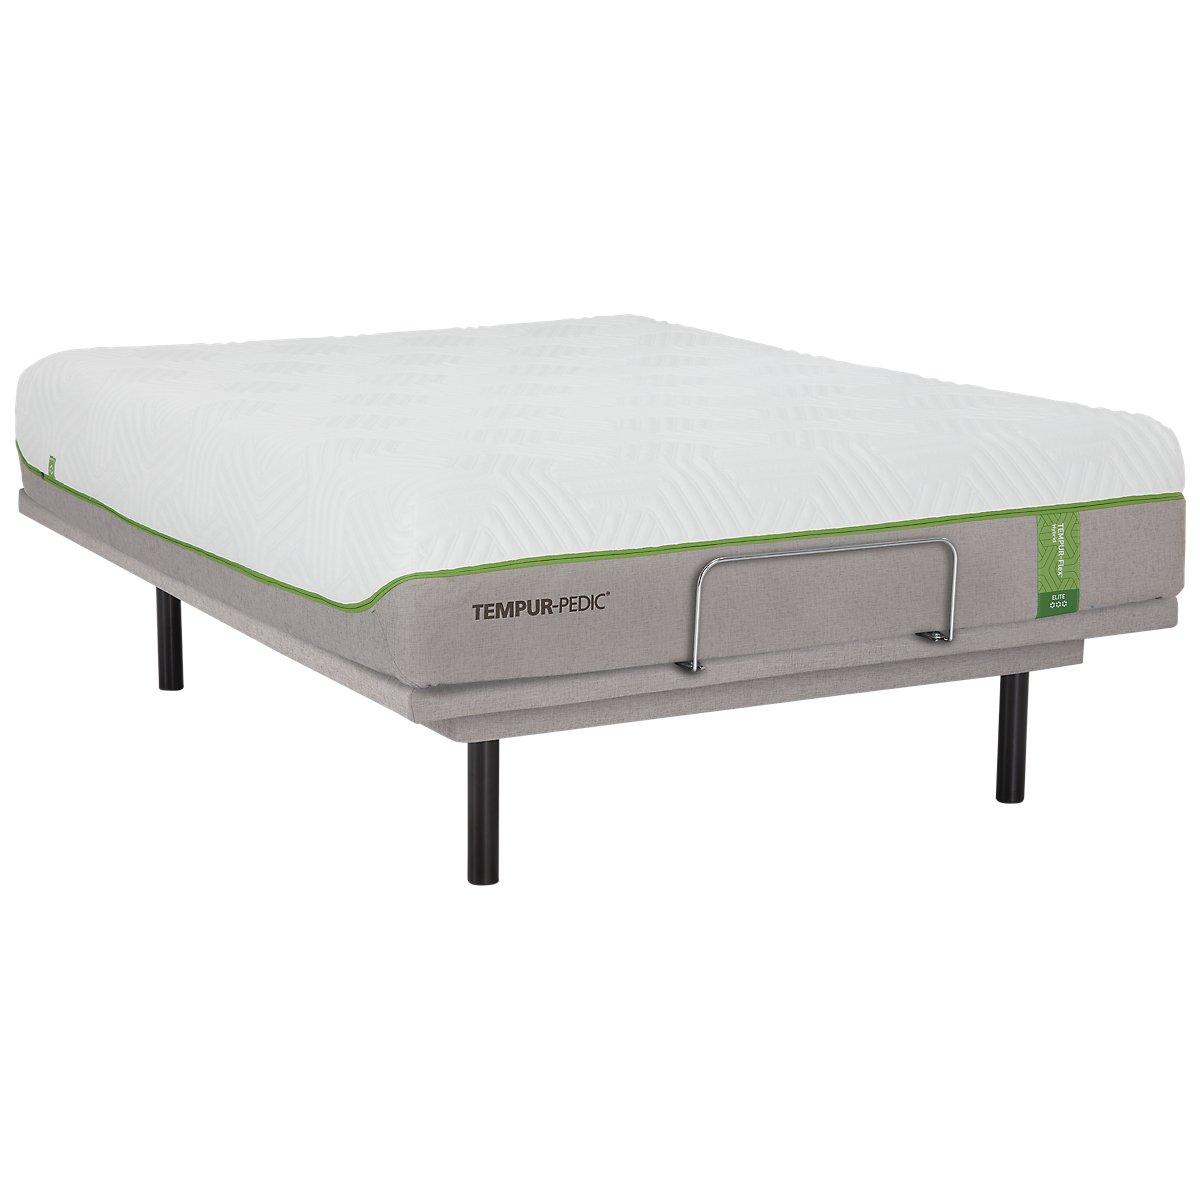 Adjustable Beds With Financing : City furniture tempur flex? elite ergo plus